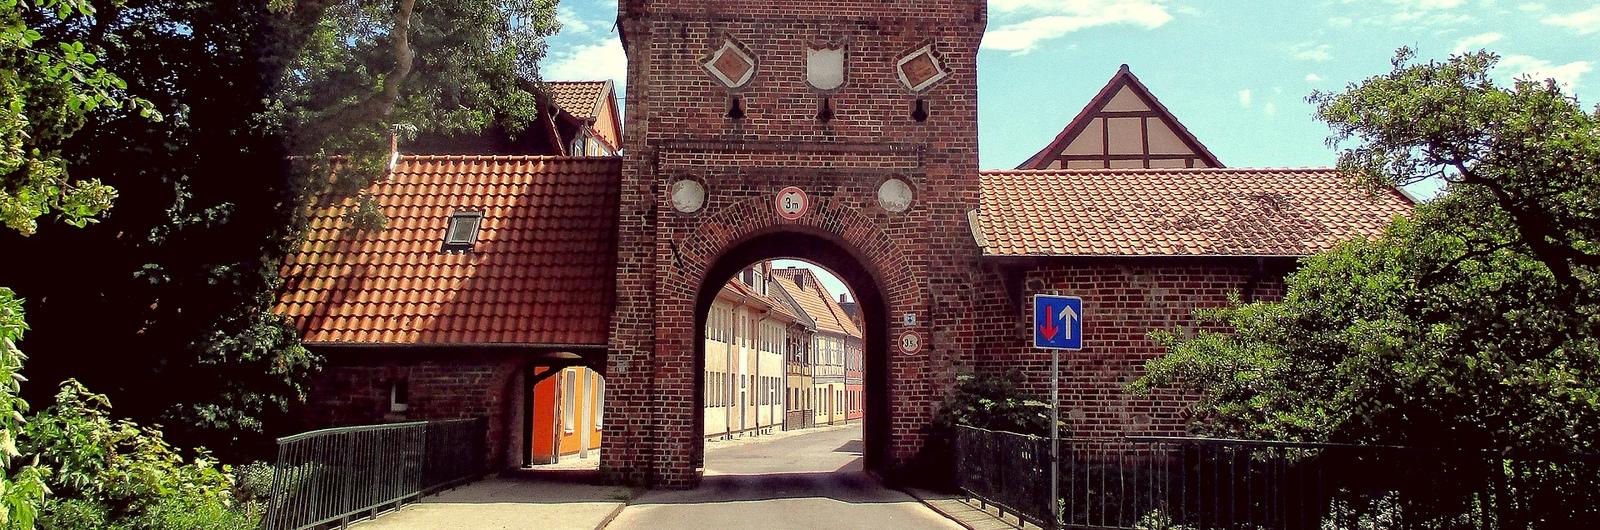 salzwedel city header